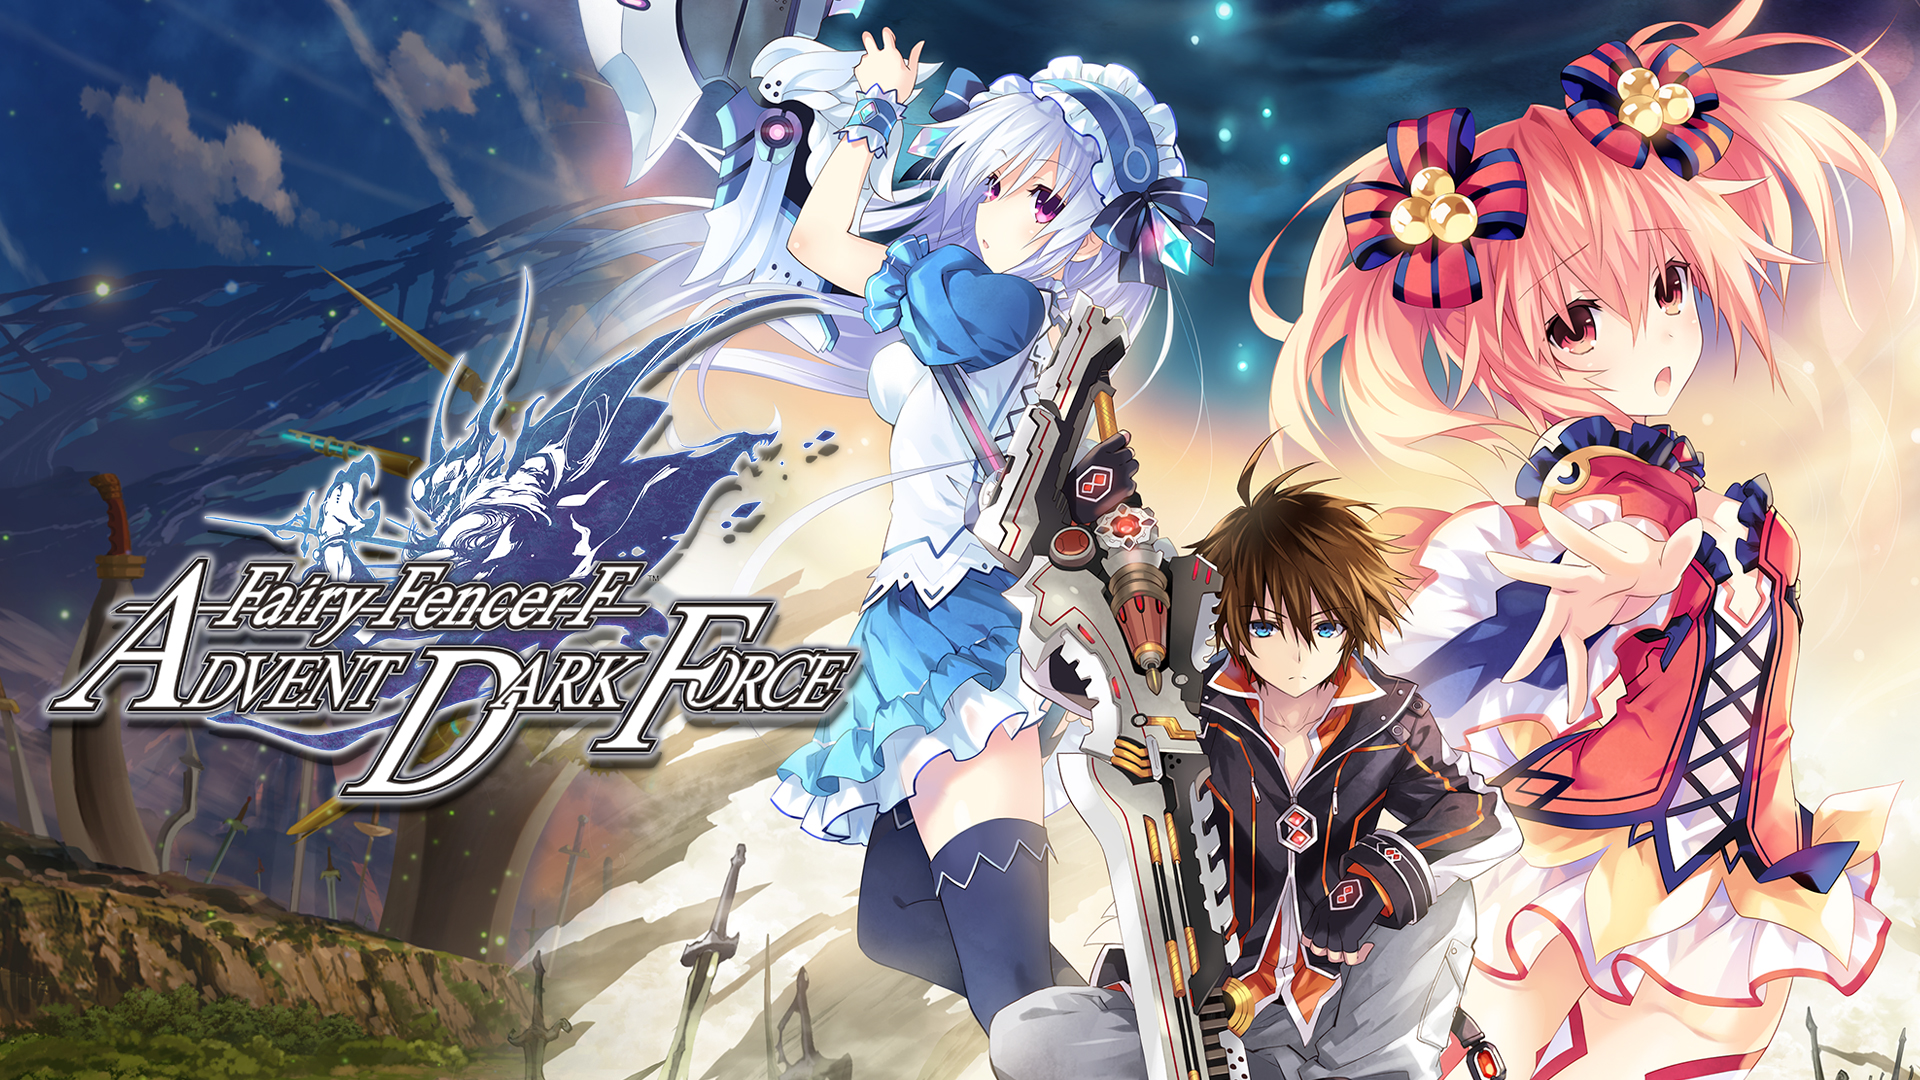 Fairy Fencer F™: Advent Dark Force